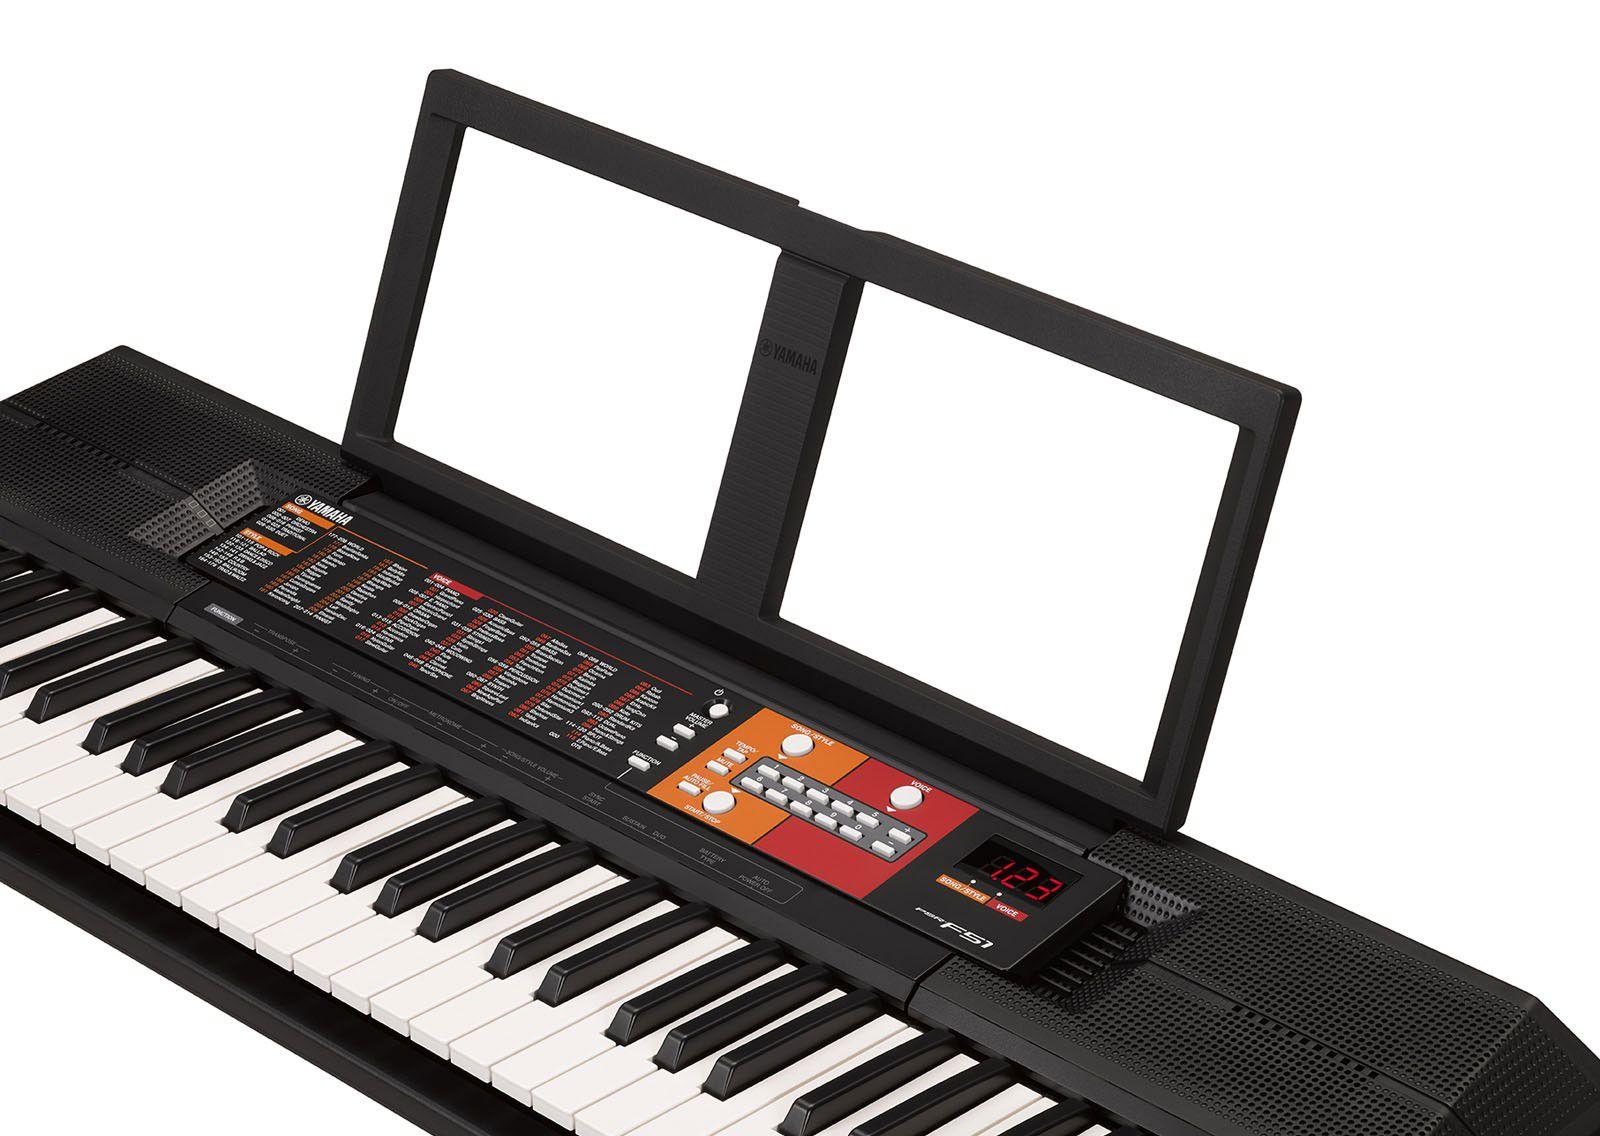 Kit Teclado Musical Yamaha Psr F51 + Suporte Capa Fone